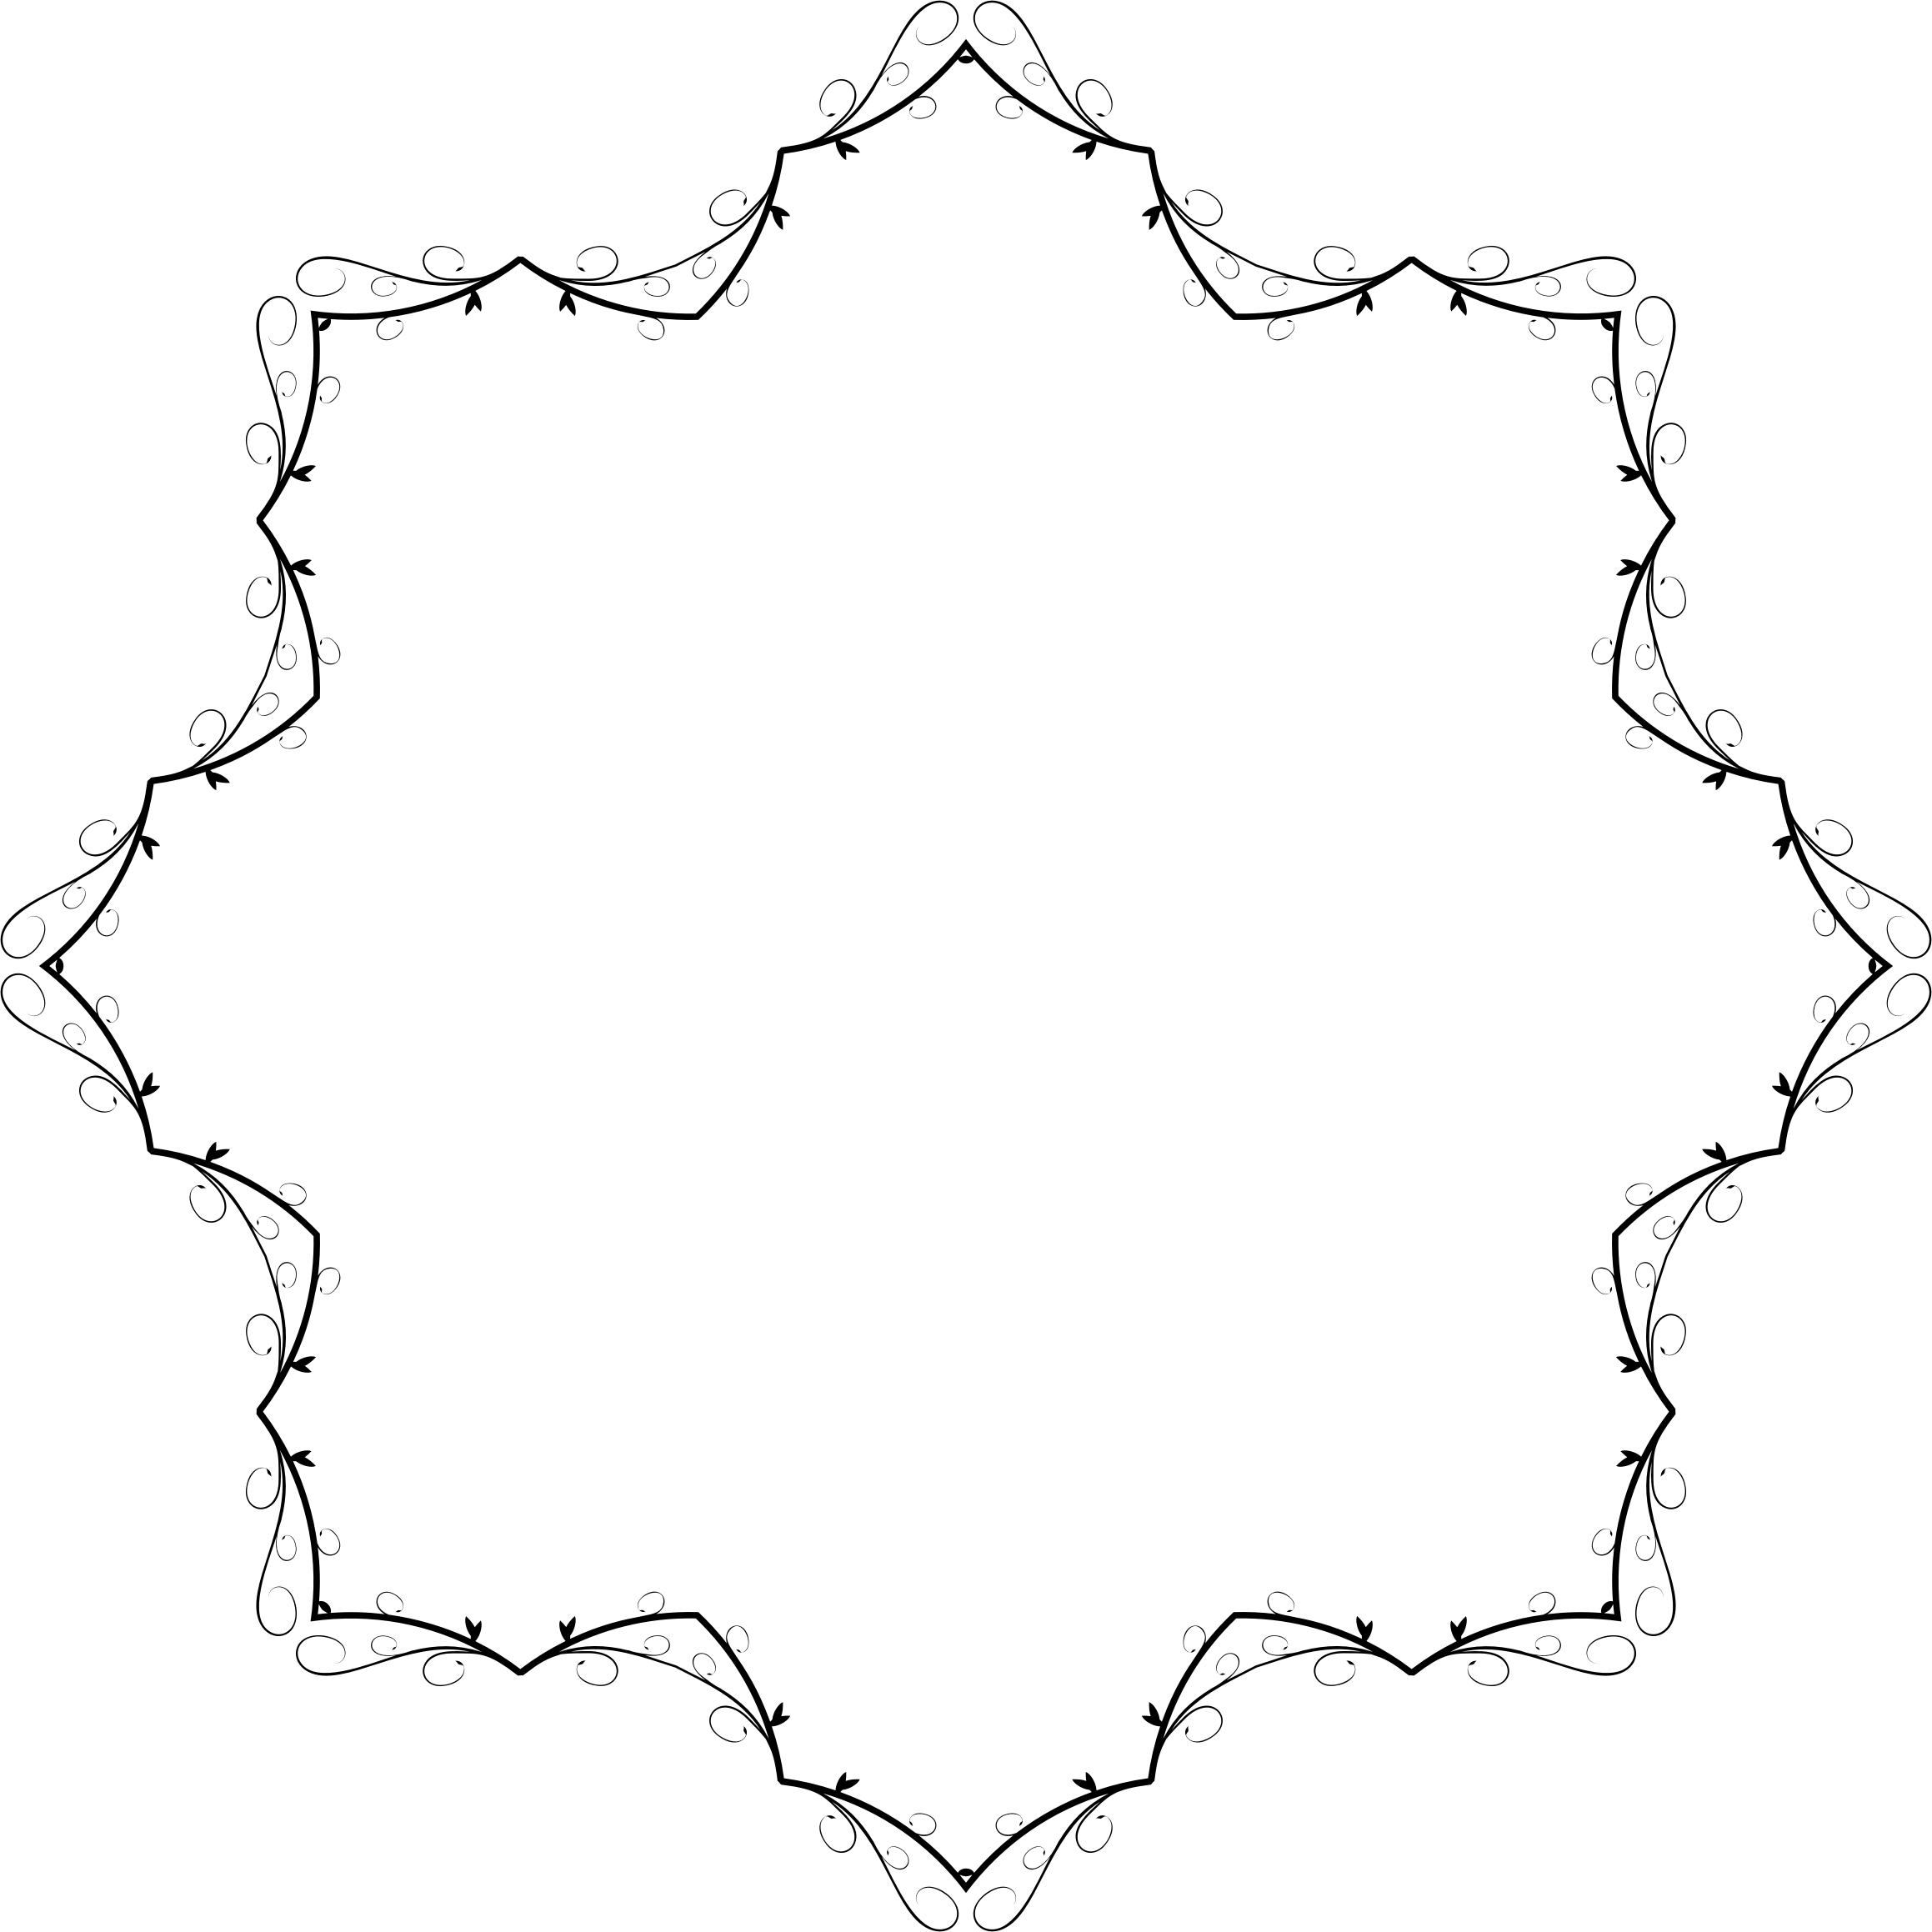 Flourish clipart orange line. Art banner extrapolated icons